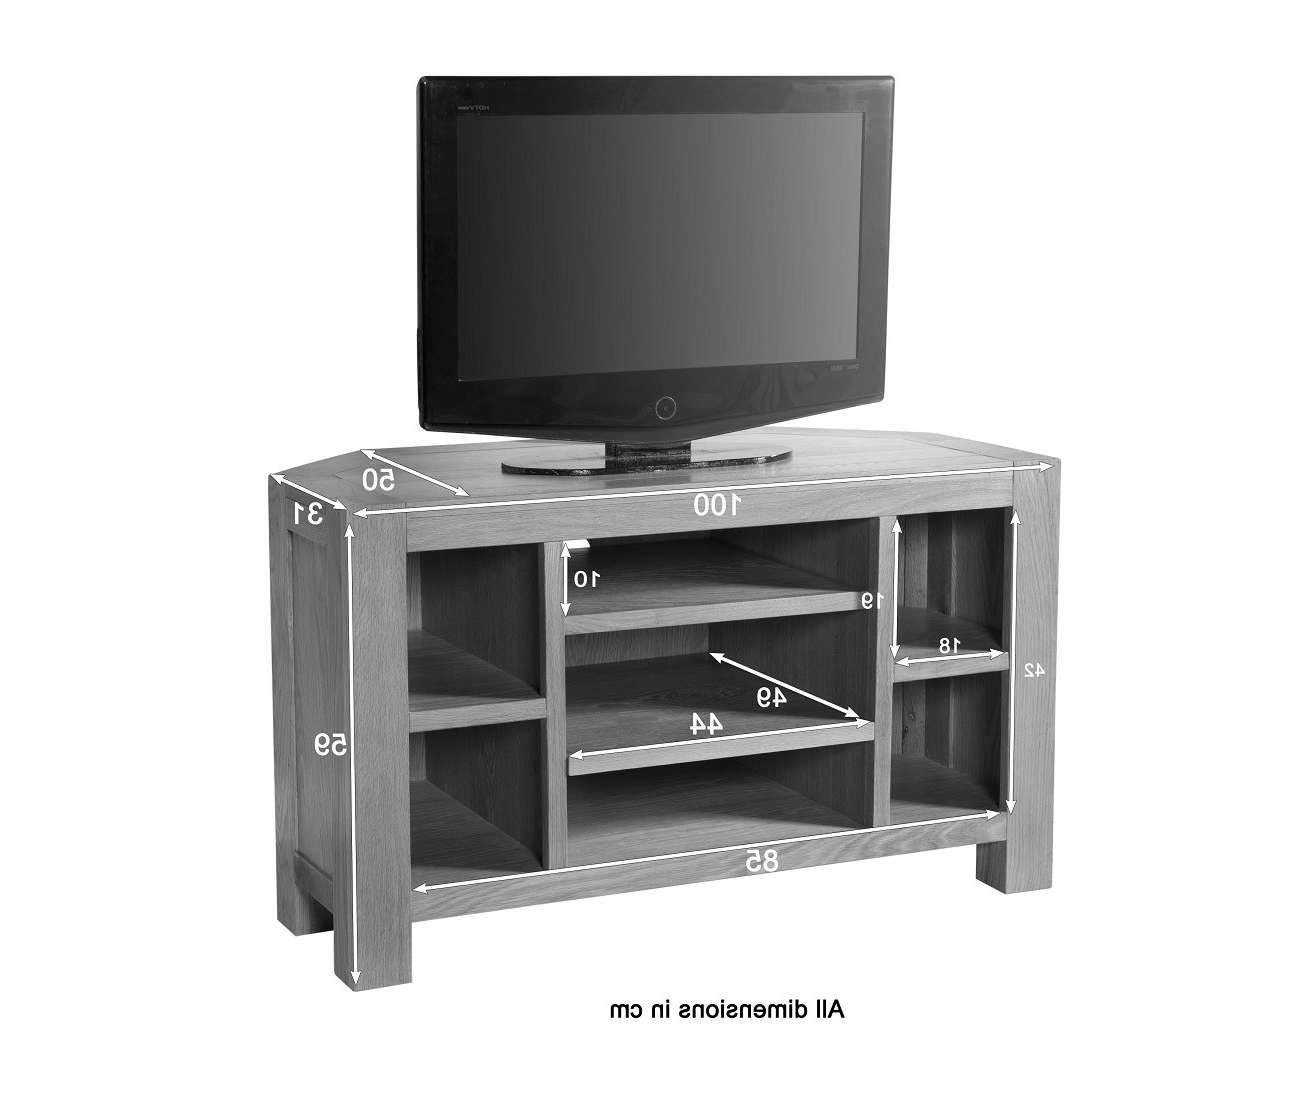 Aylesbury Contemporary Light Oak Corner Tv Unit | Oak Furniture Uk Inside White Corner Tv Cabinets (View 16 of 20)